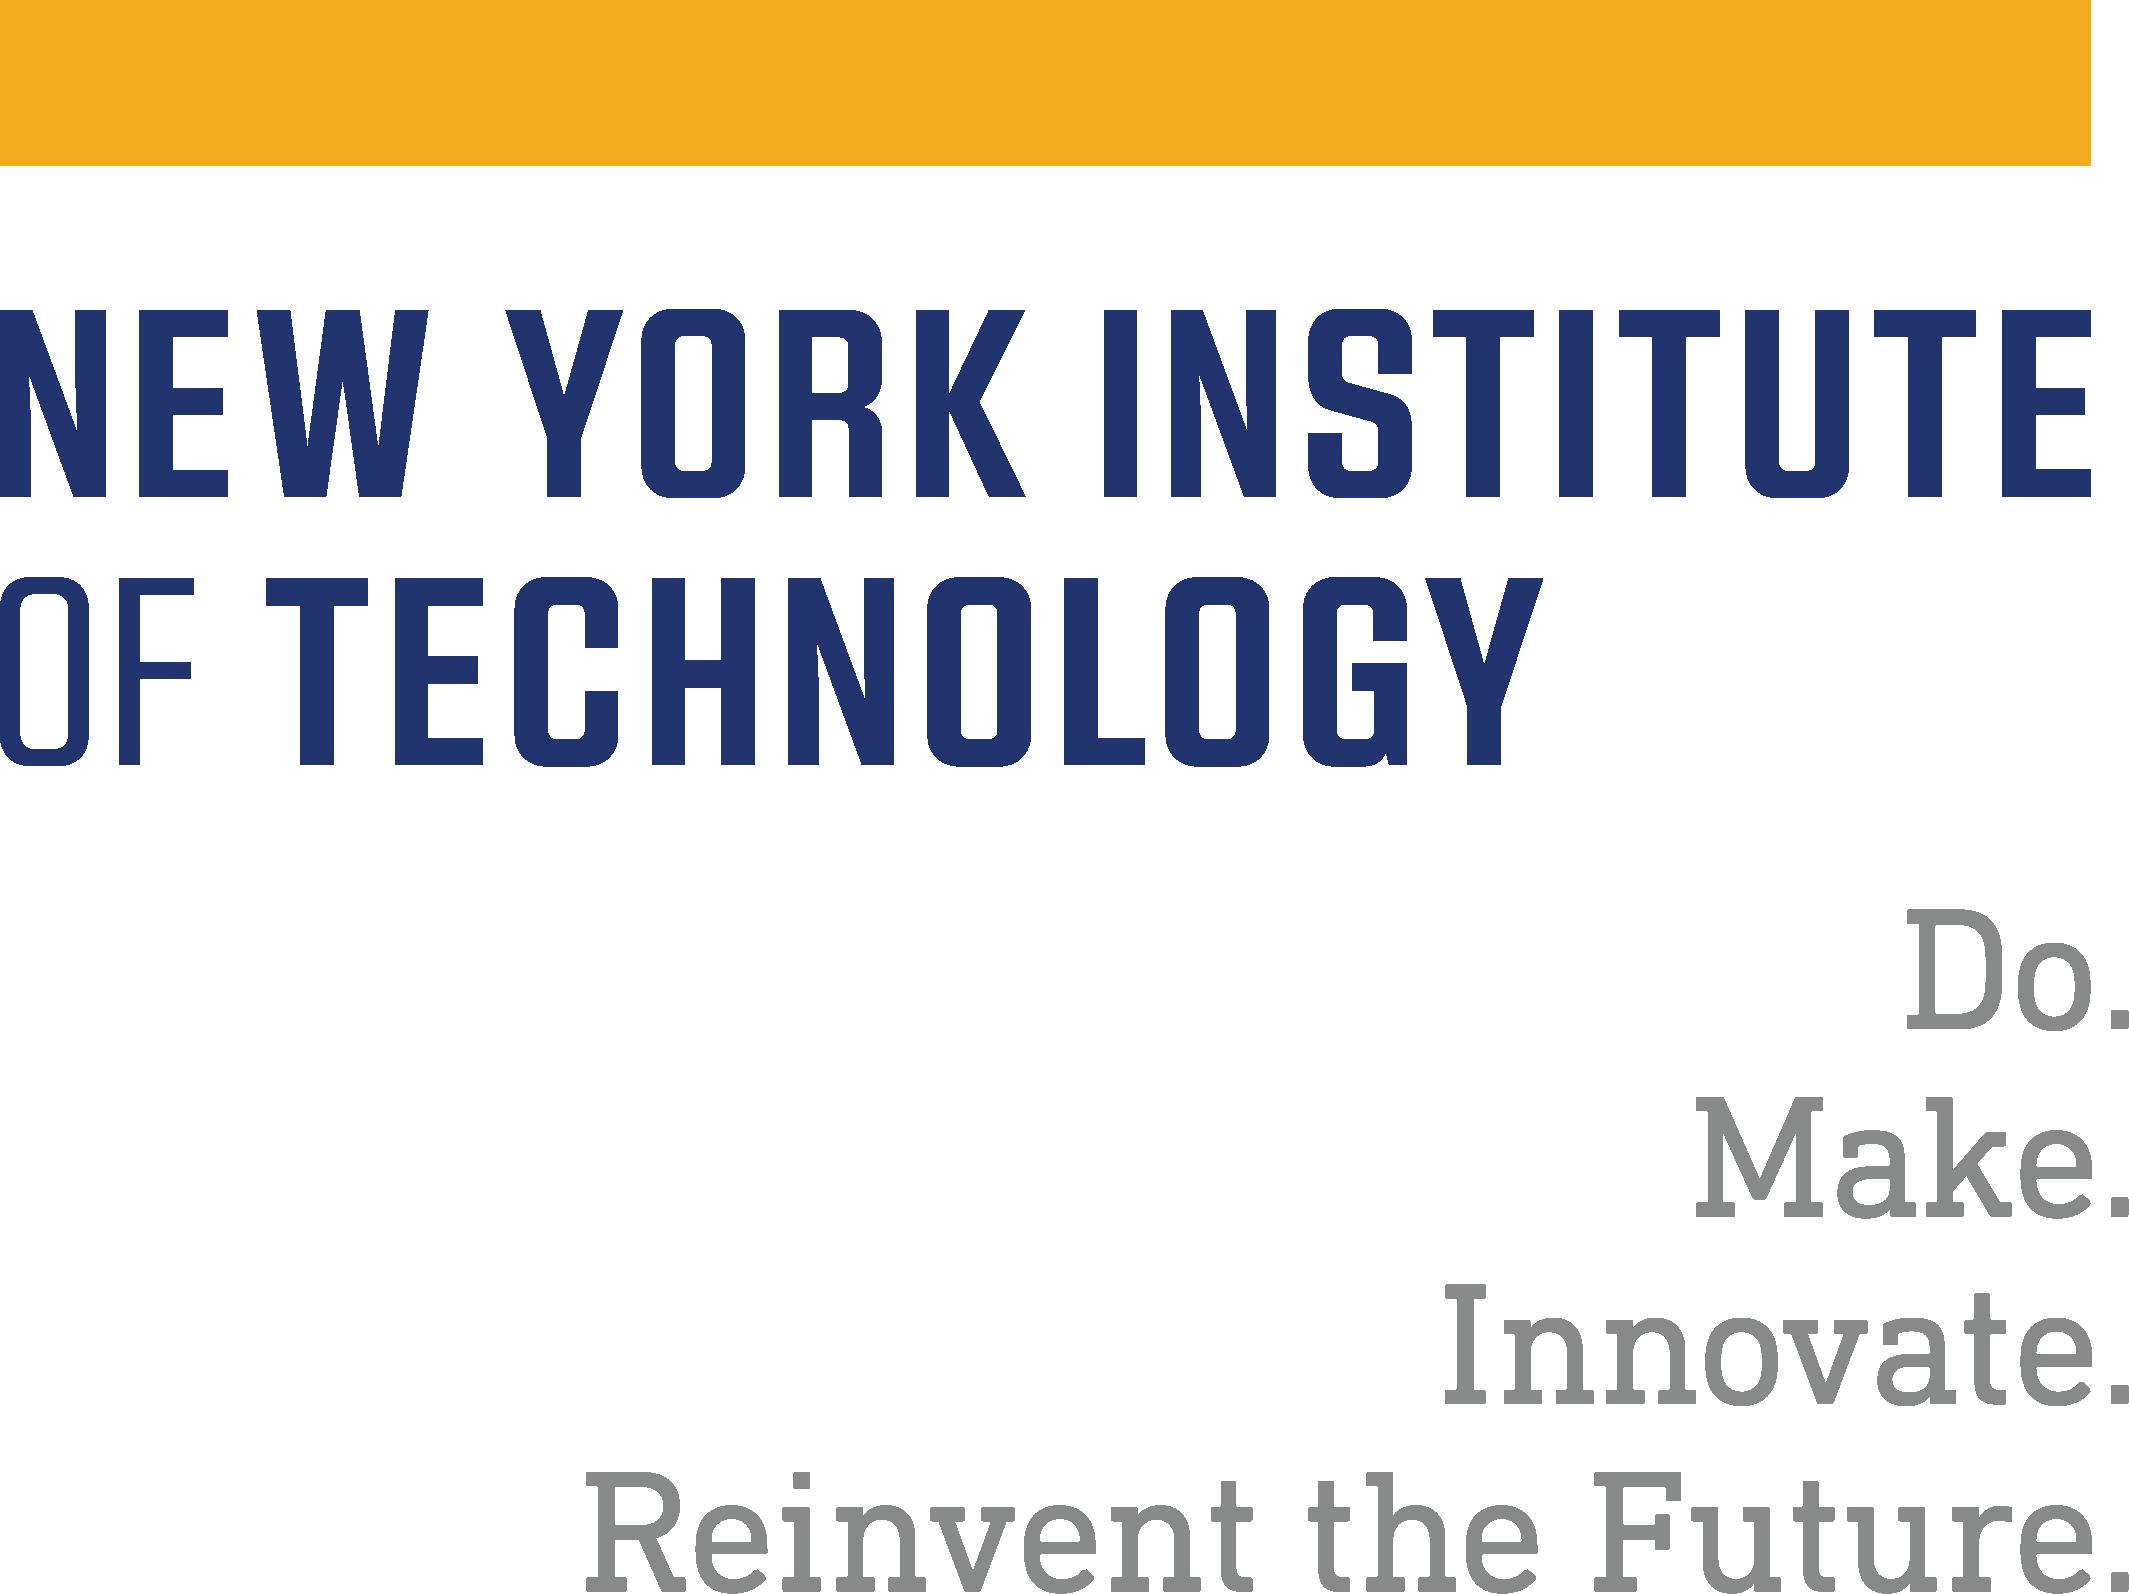 New York Institute of Technology: Digital Arts Major